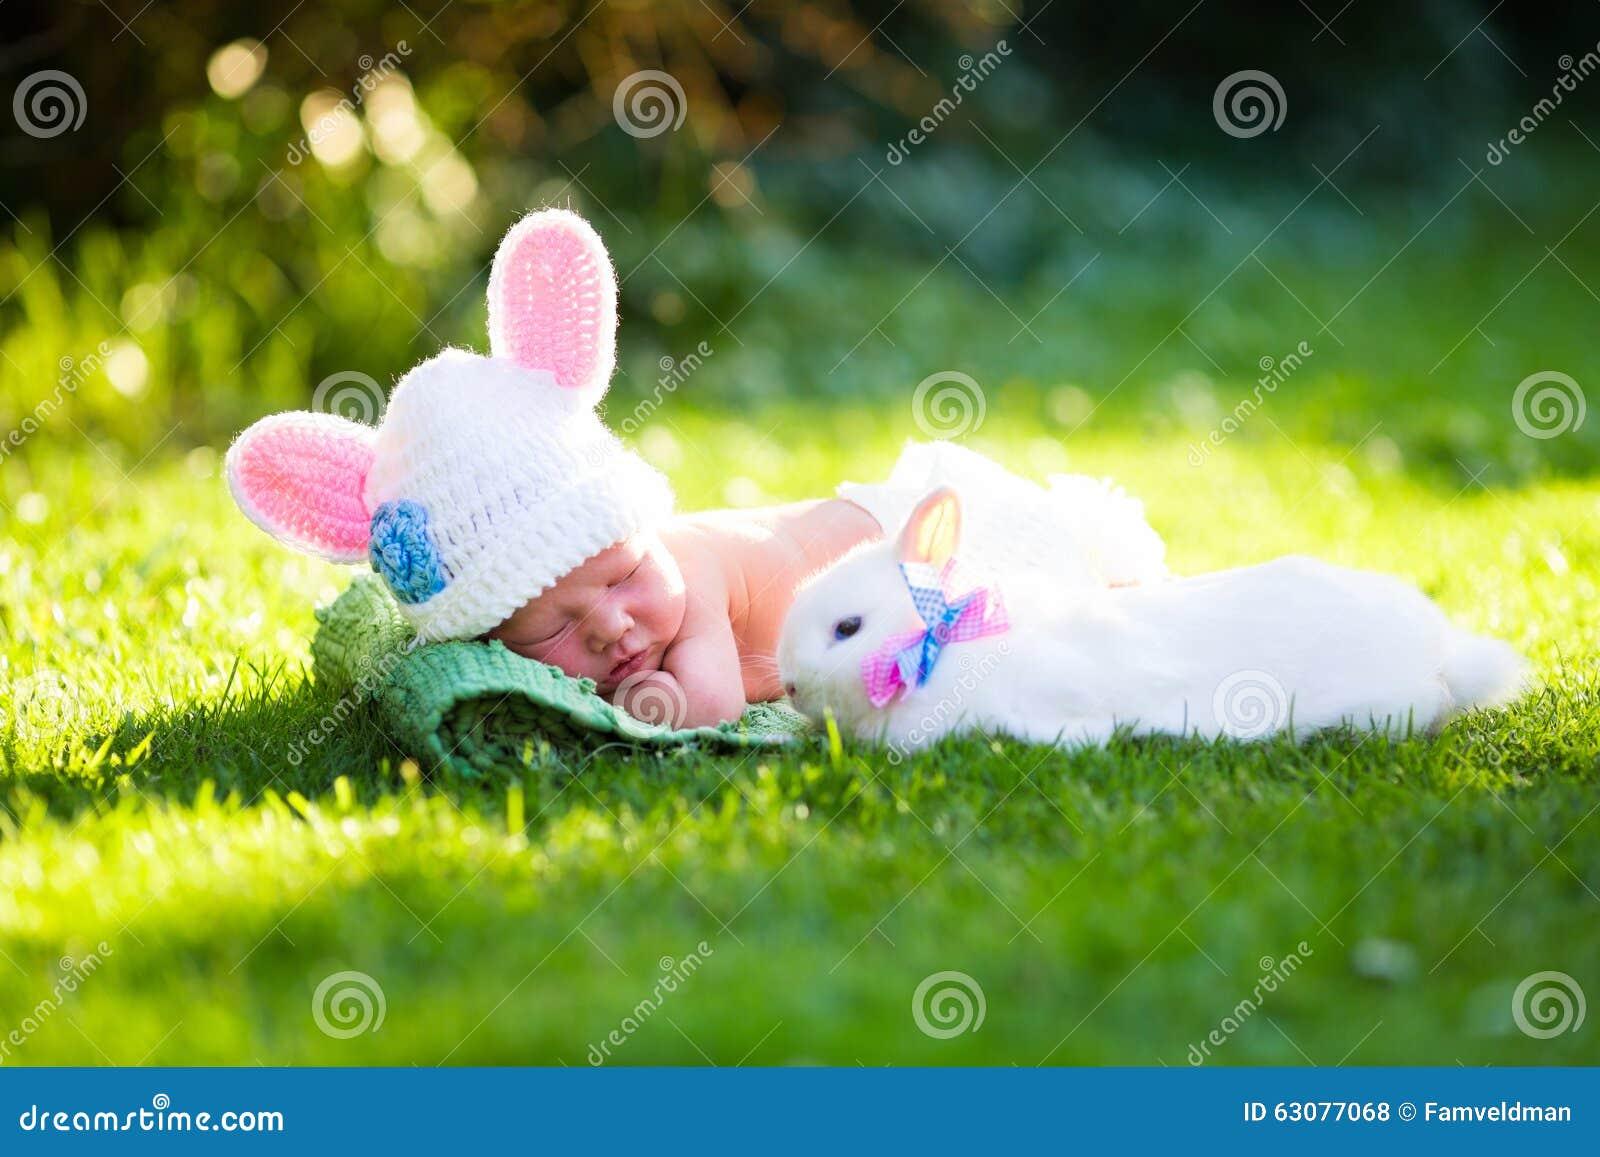 Newborn Baby Boy Easter Bunny